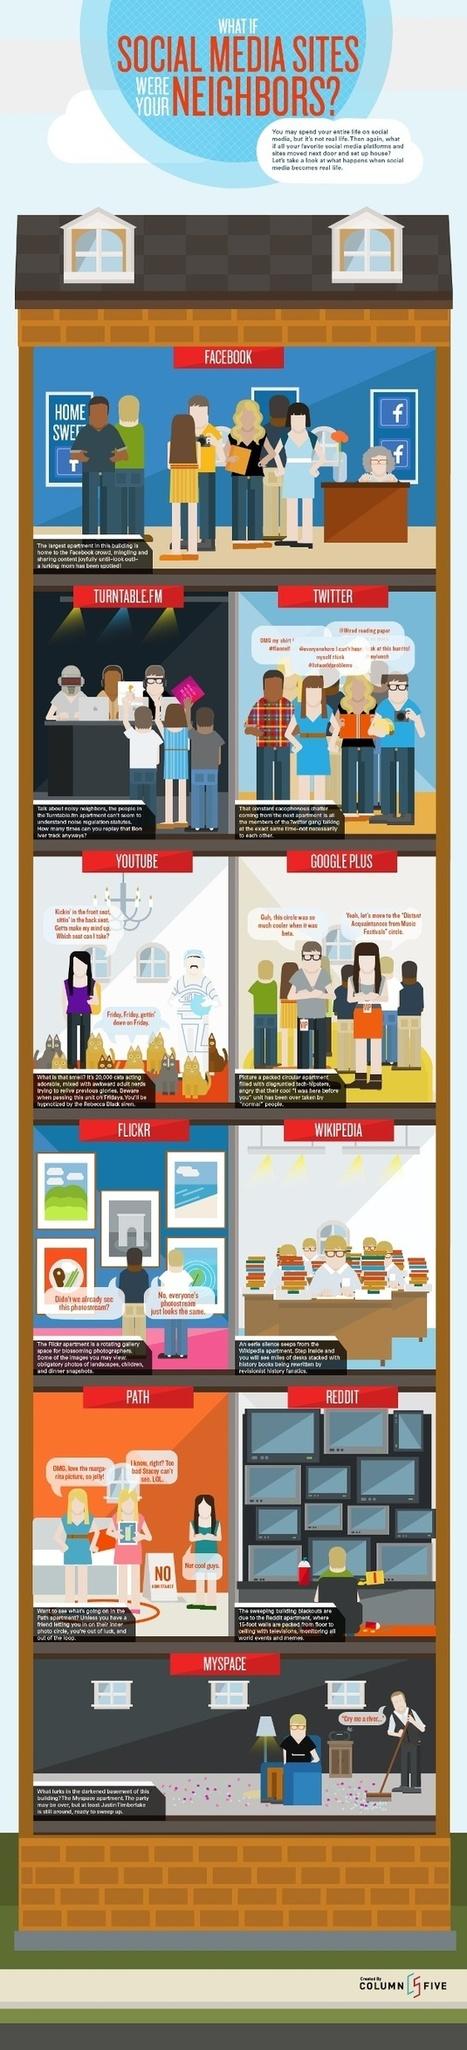 Social Media | AlternaTICA - Des interactions numériques aux interactions sociales | Scoop.it